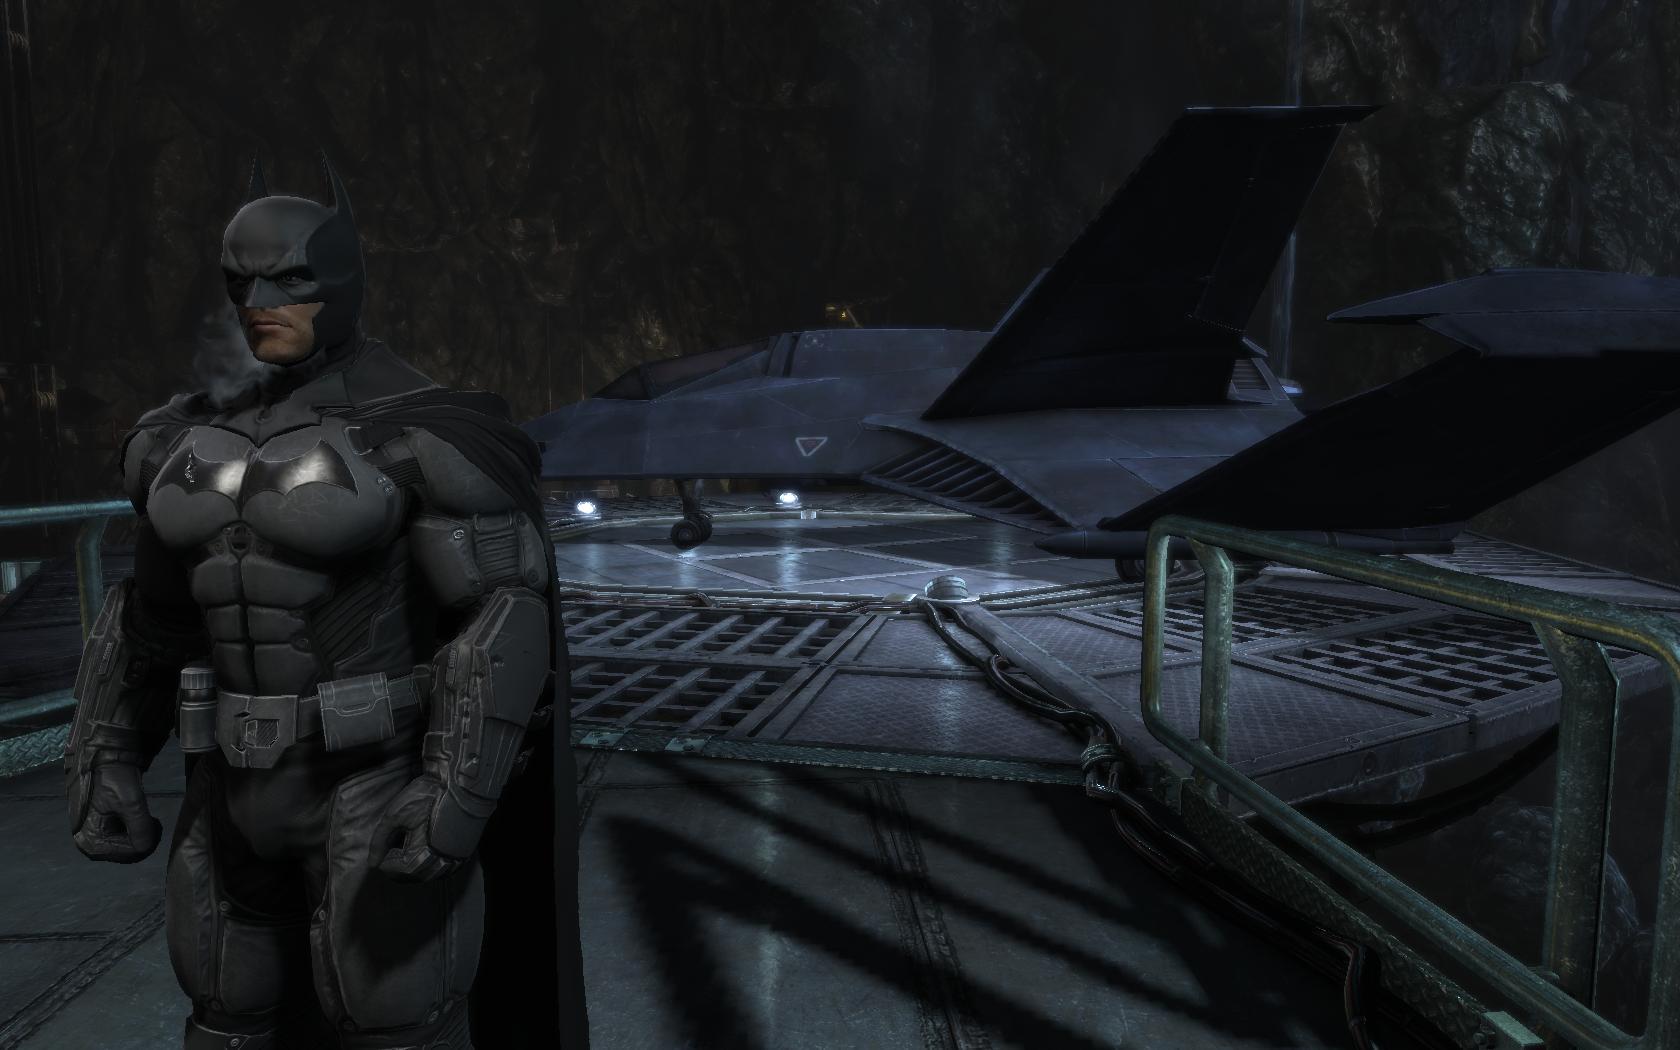 BatmanOrigins 2013-12-12 00-09-35-39.jpg